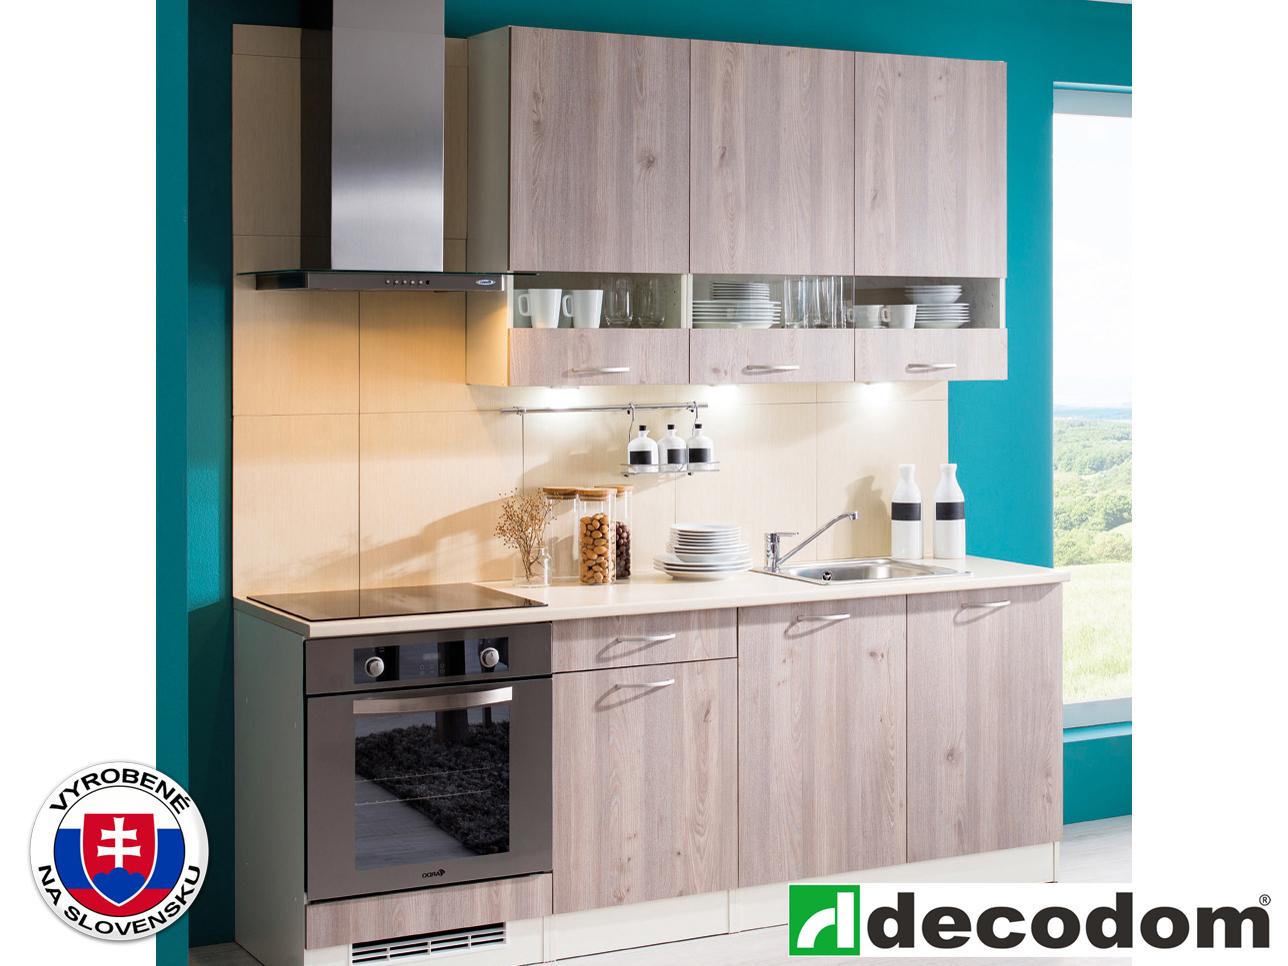 Kuchyňa - Decodom - Nela modern 210 cm dub nelson